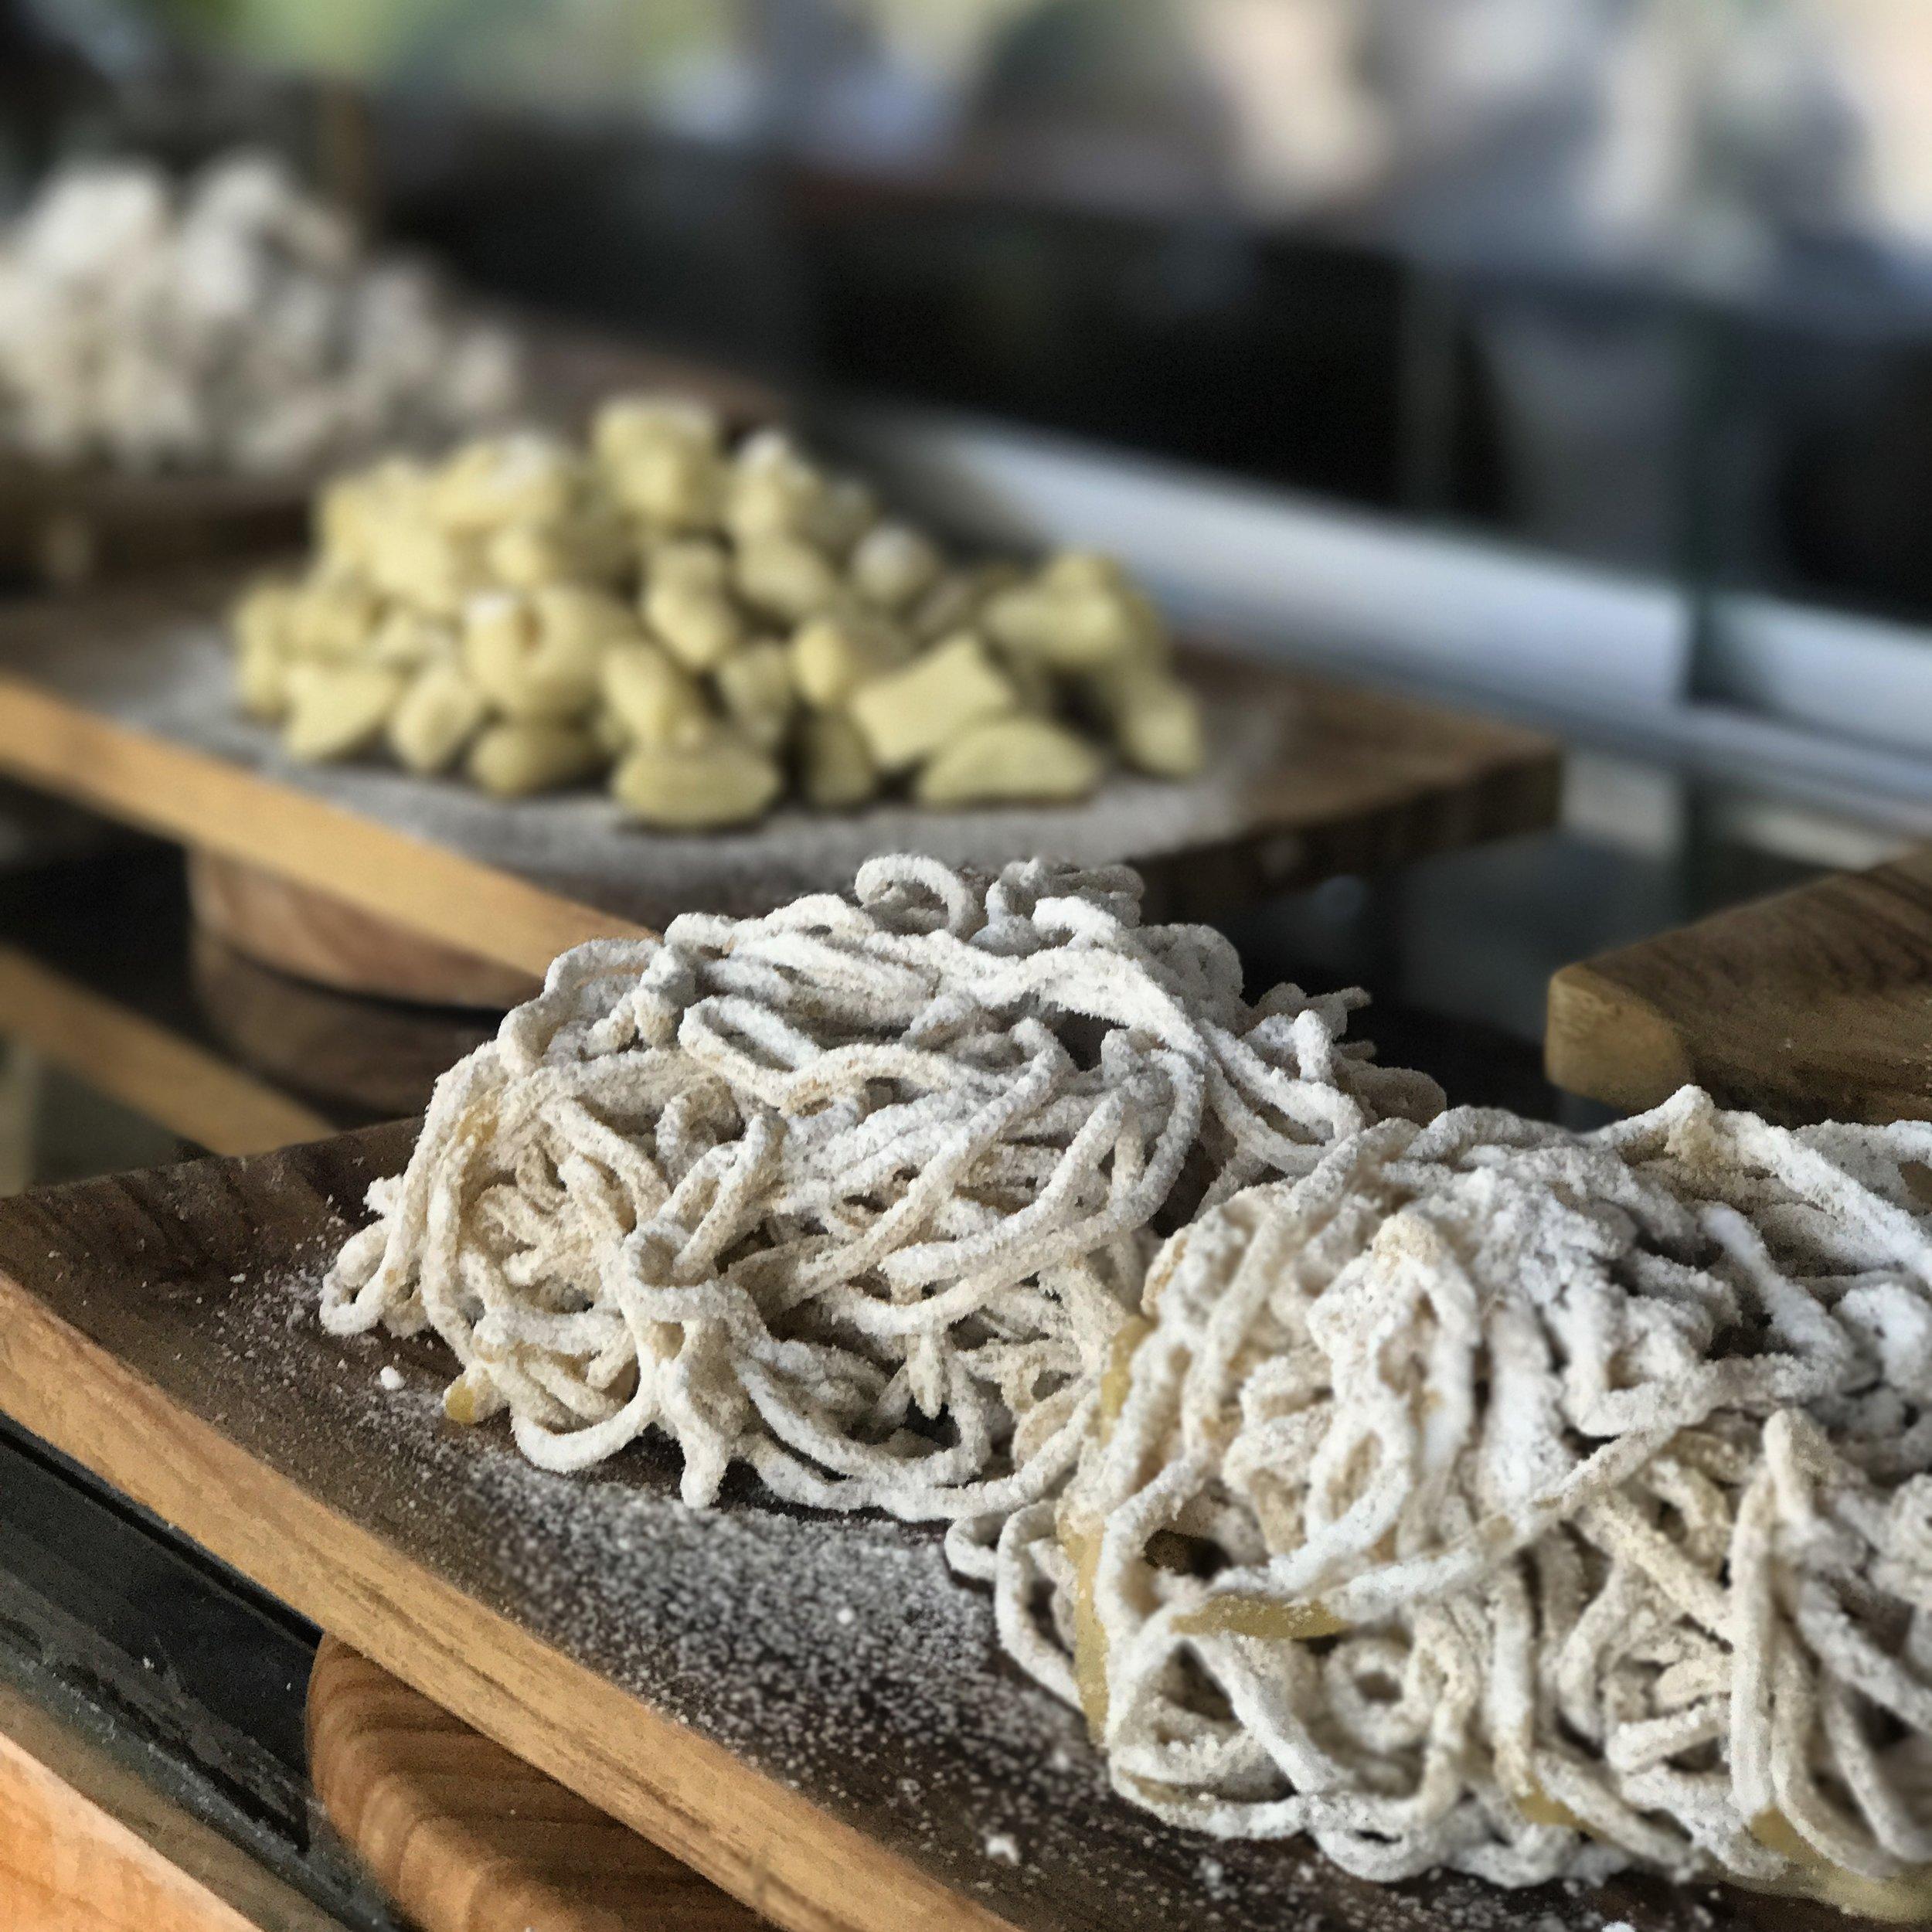 where-to-eat-in-canggu-bottega-italiana-bali-photos-by-caity-in-wanderland-blogger_07.jpg